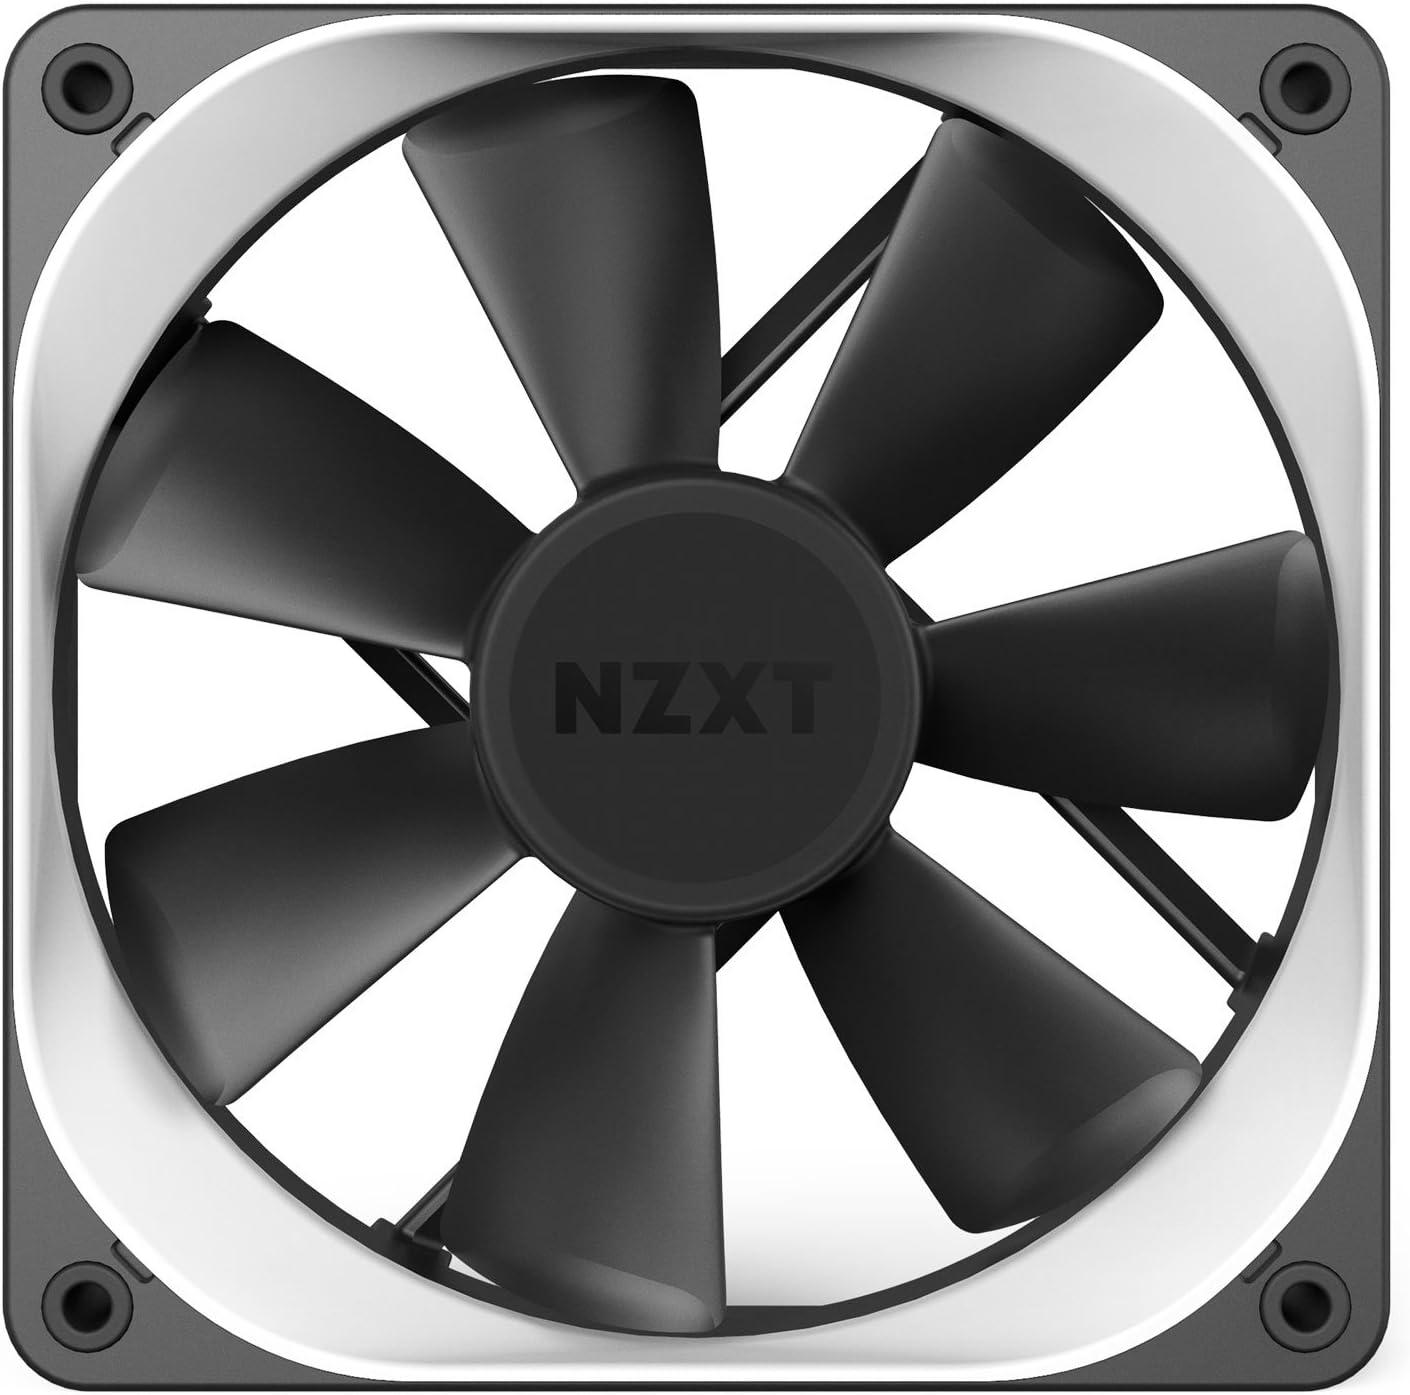 Nzxt - Embellecedor Trims para Ventilador de 120mm (RF-ACT12-W1), Color Blanco